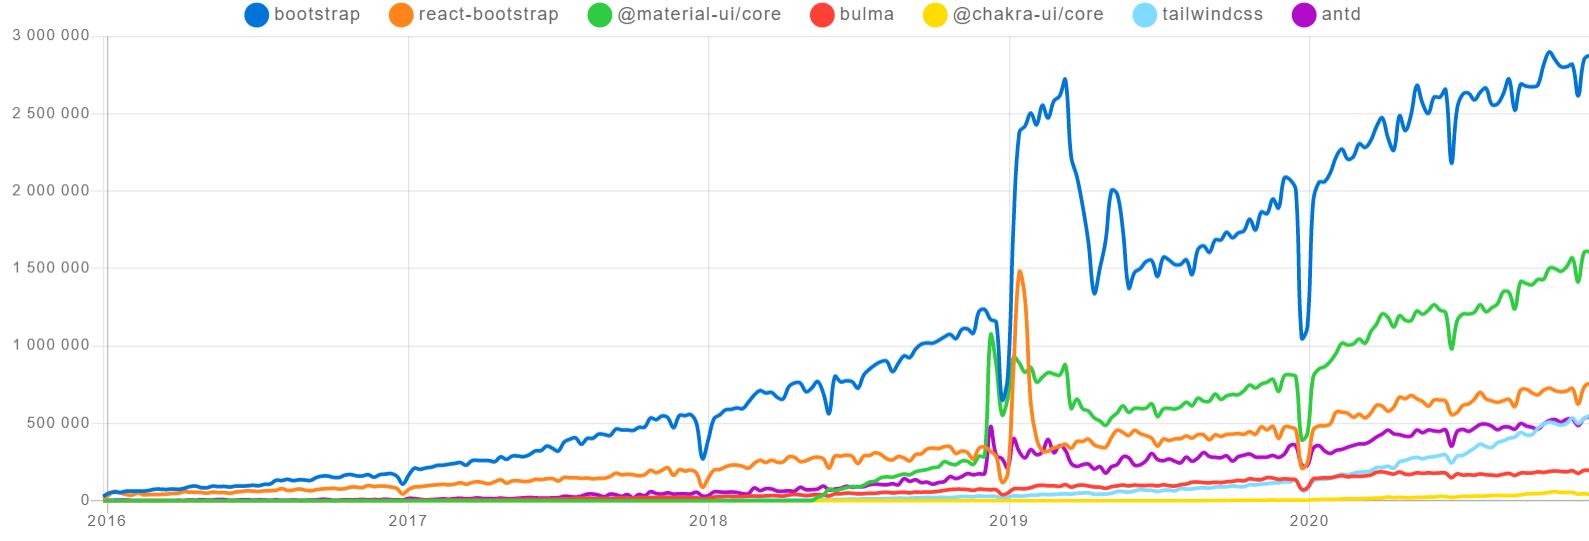 npm trends